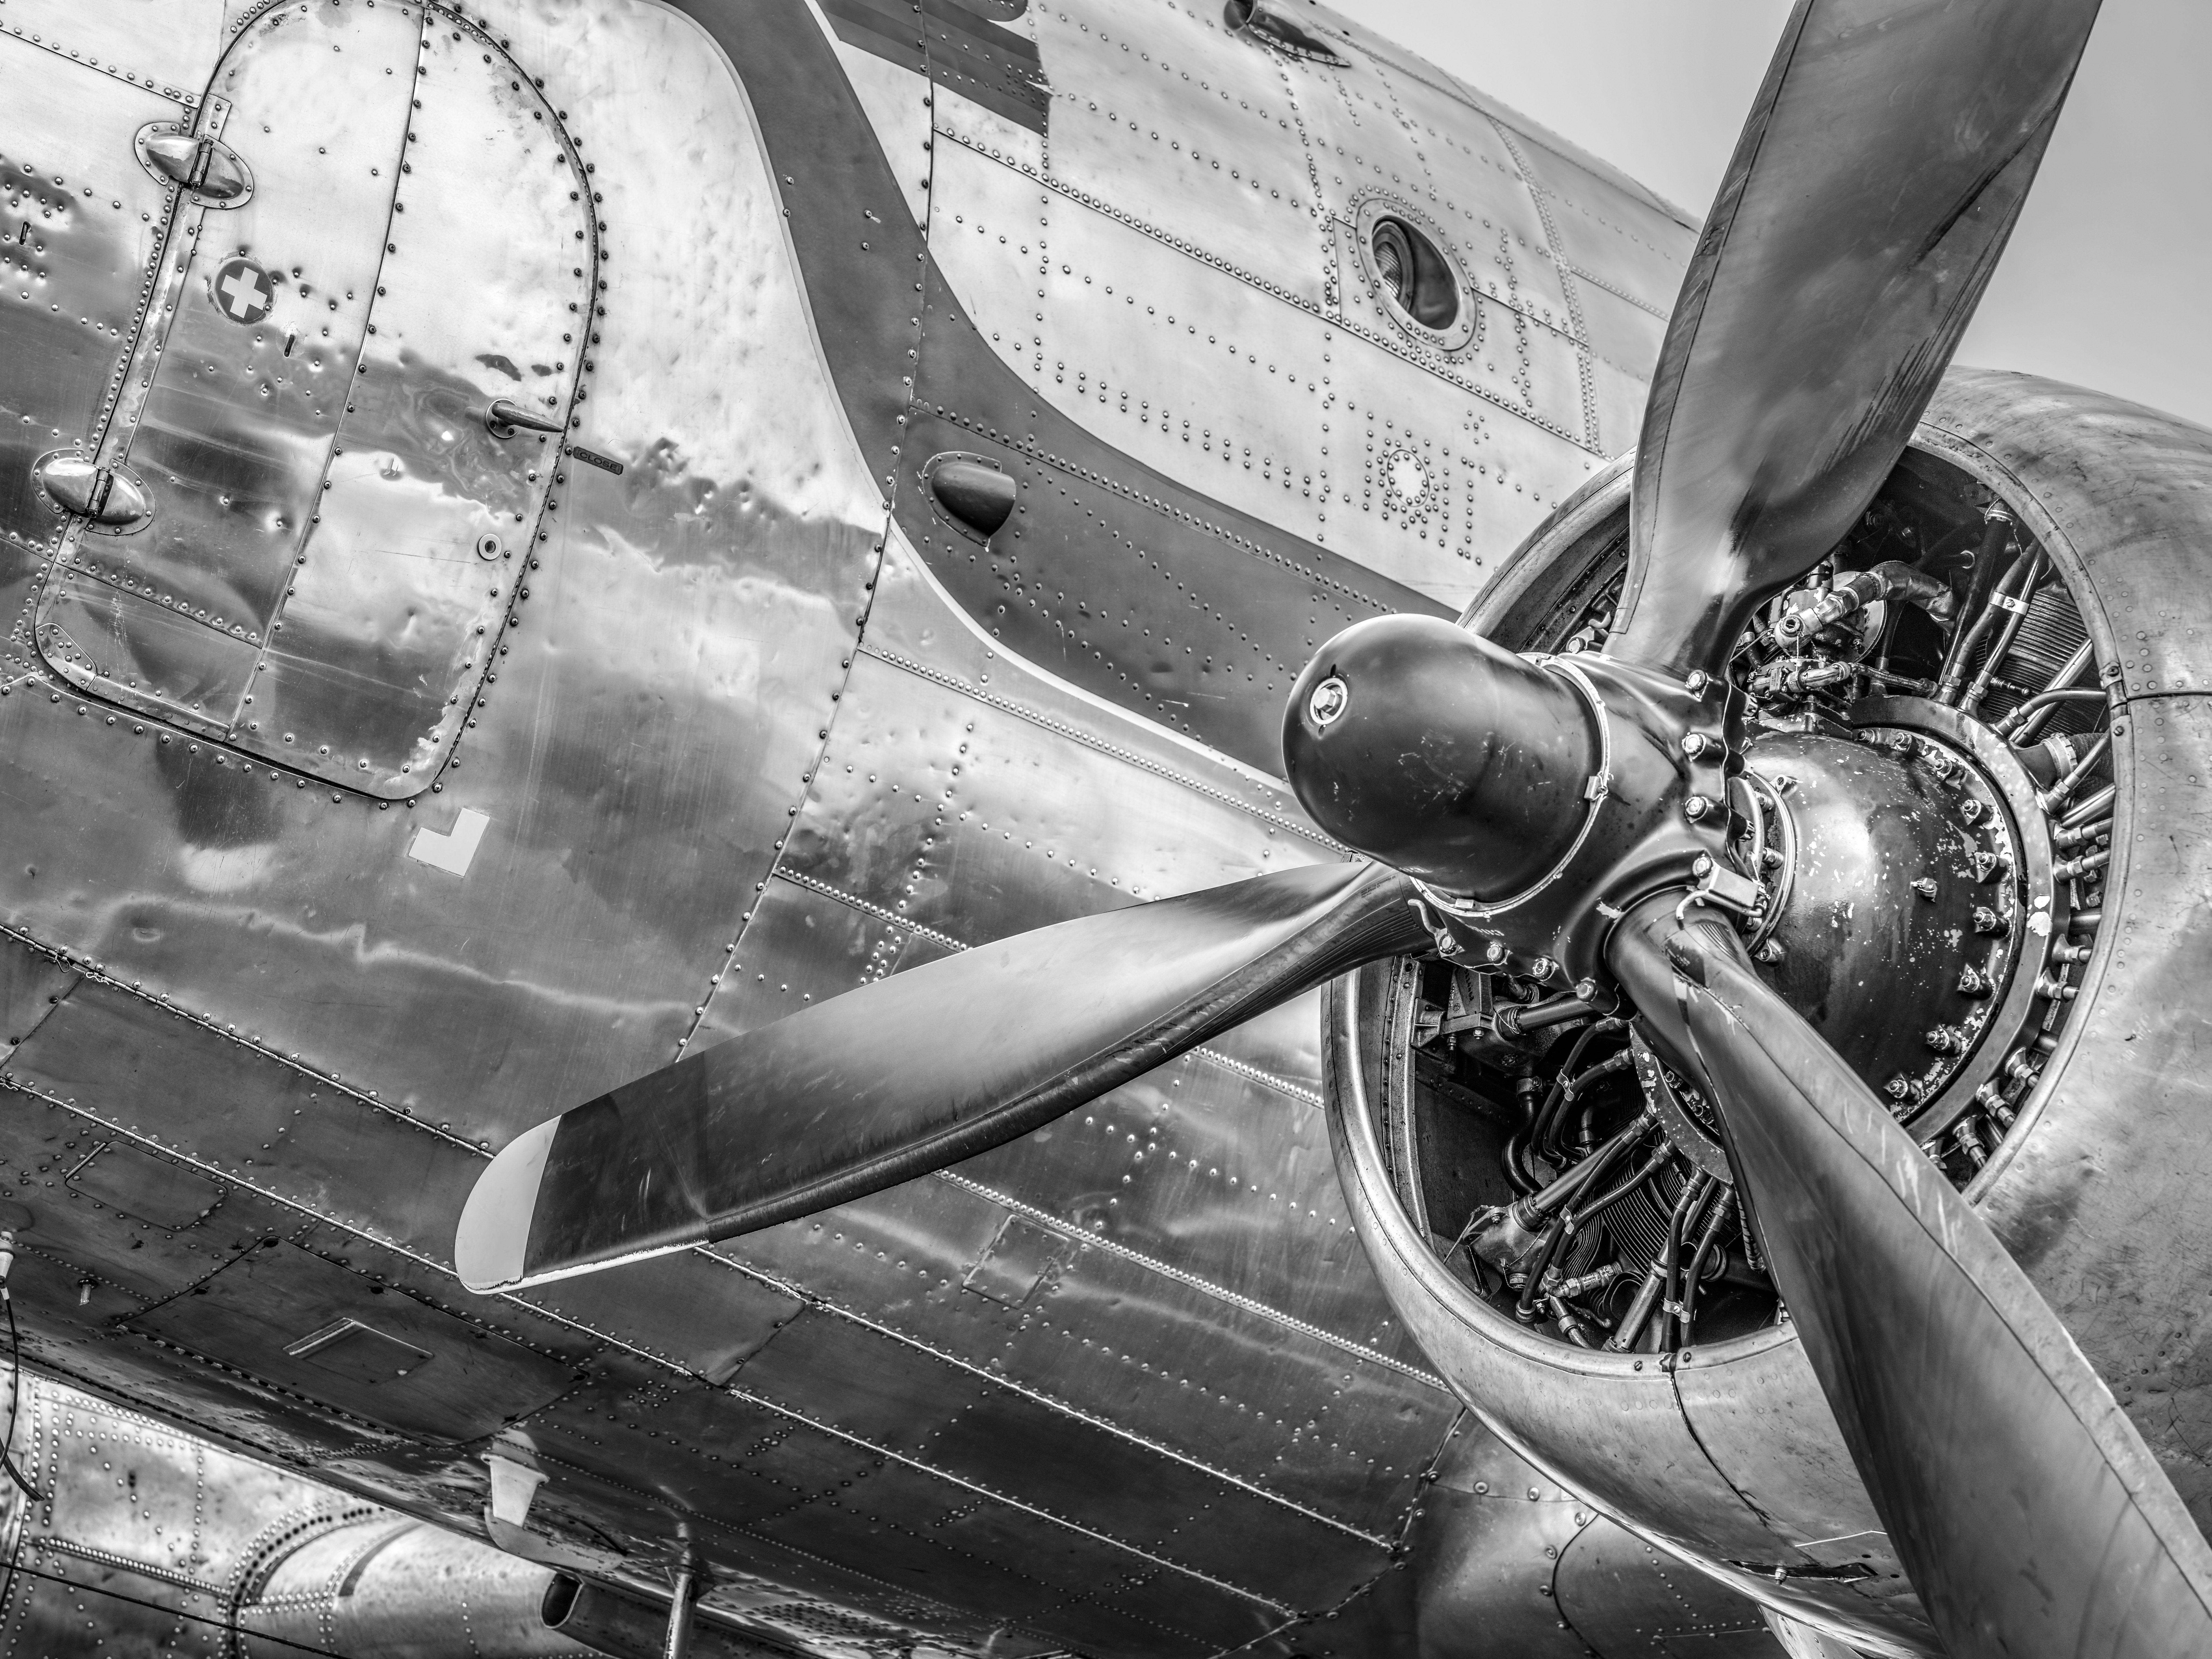 Vintage Douglas DC-3 propeller airplane ready for take off